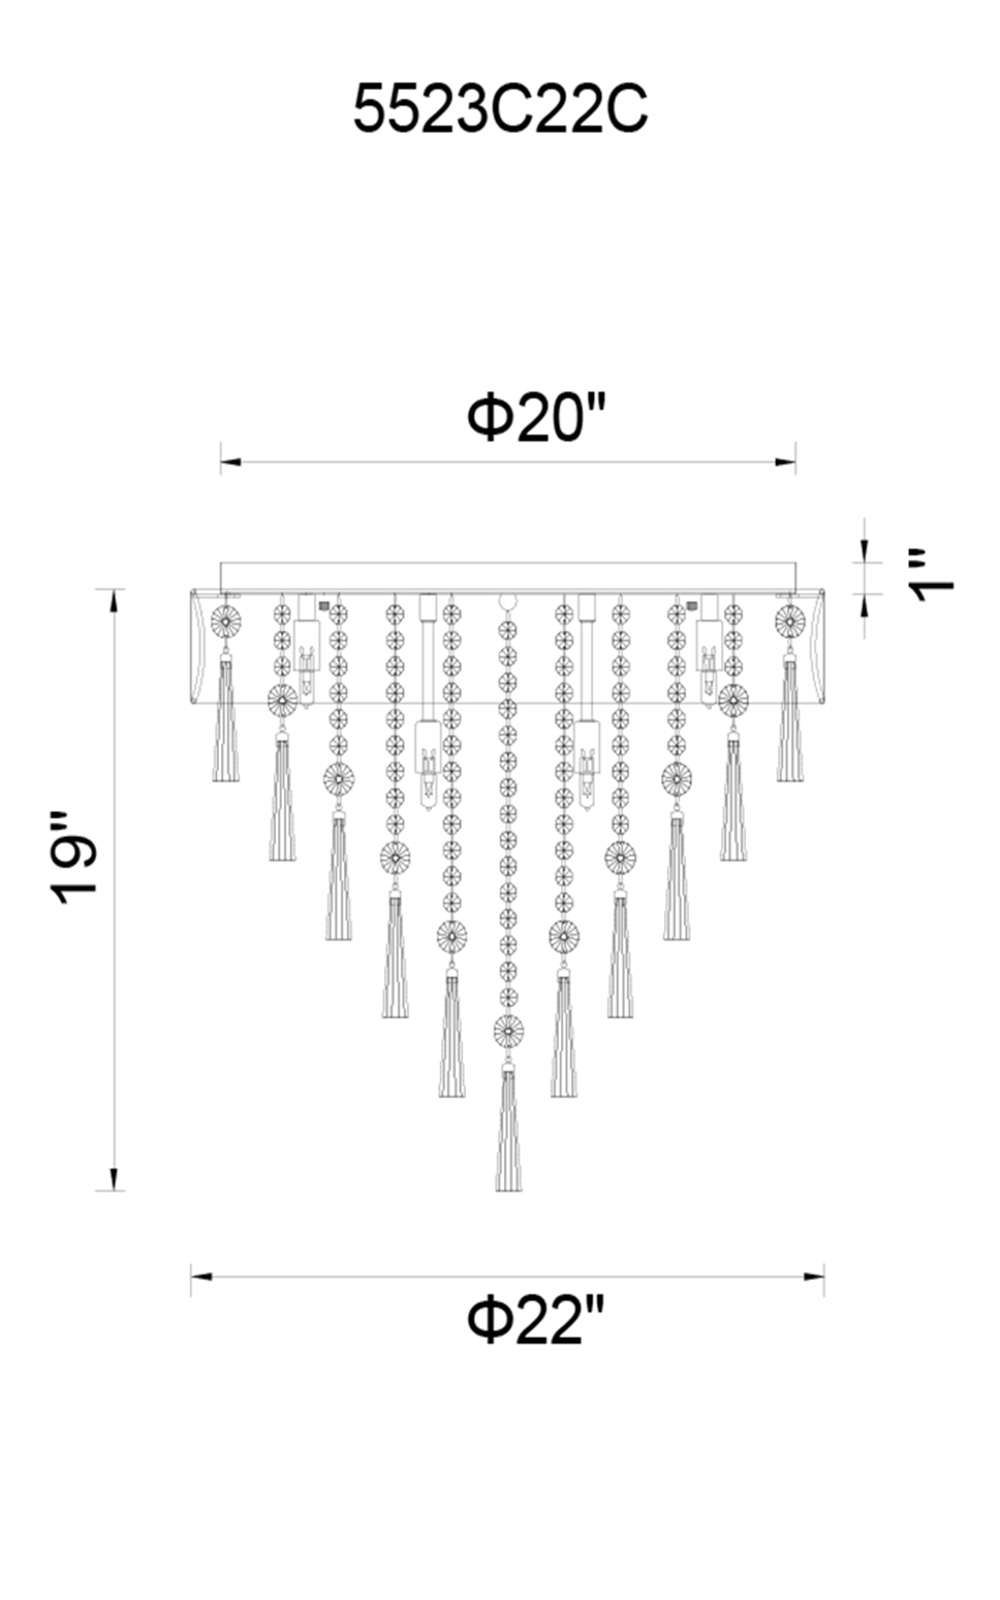 CWI Lighting Franca 8 Light Drum Shade Flush Mount With Chrome Model: 5523C22C (BLACK) Line Drawing